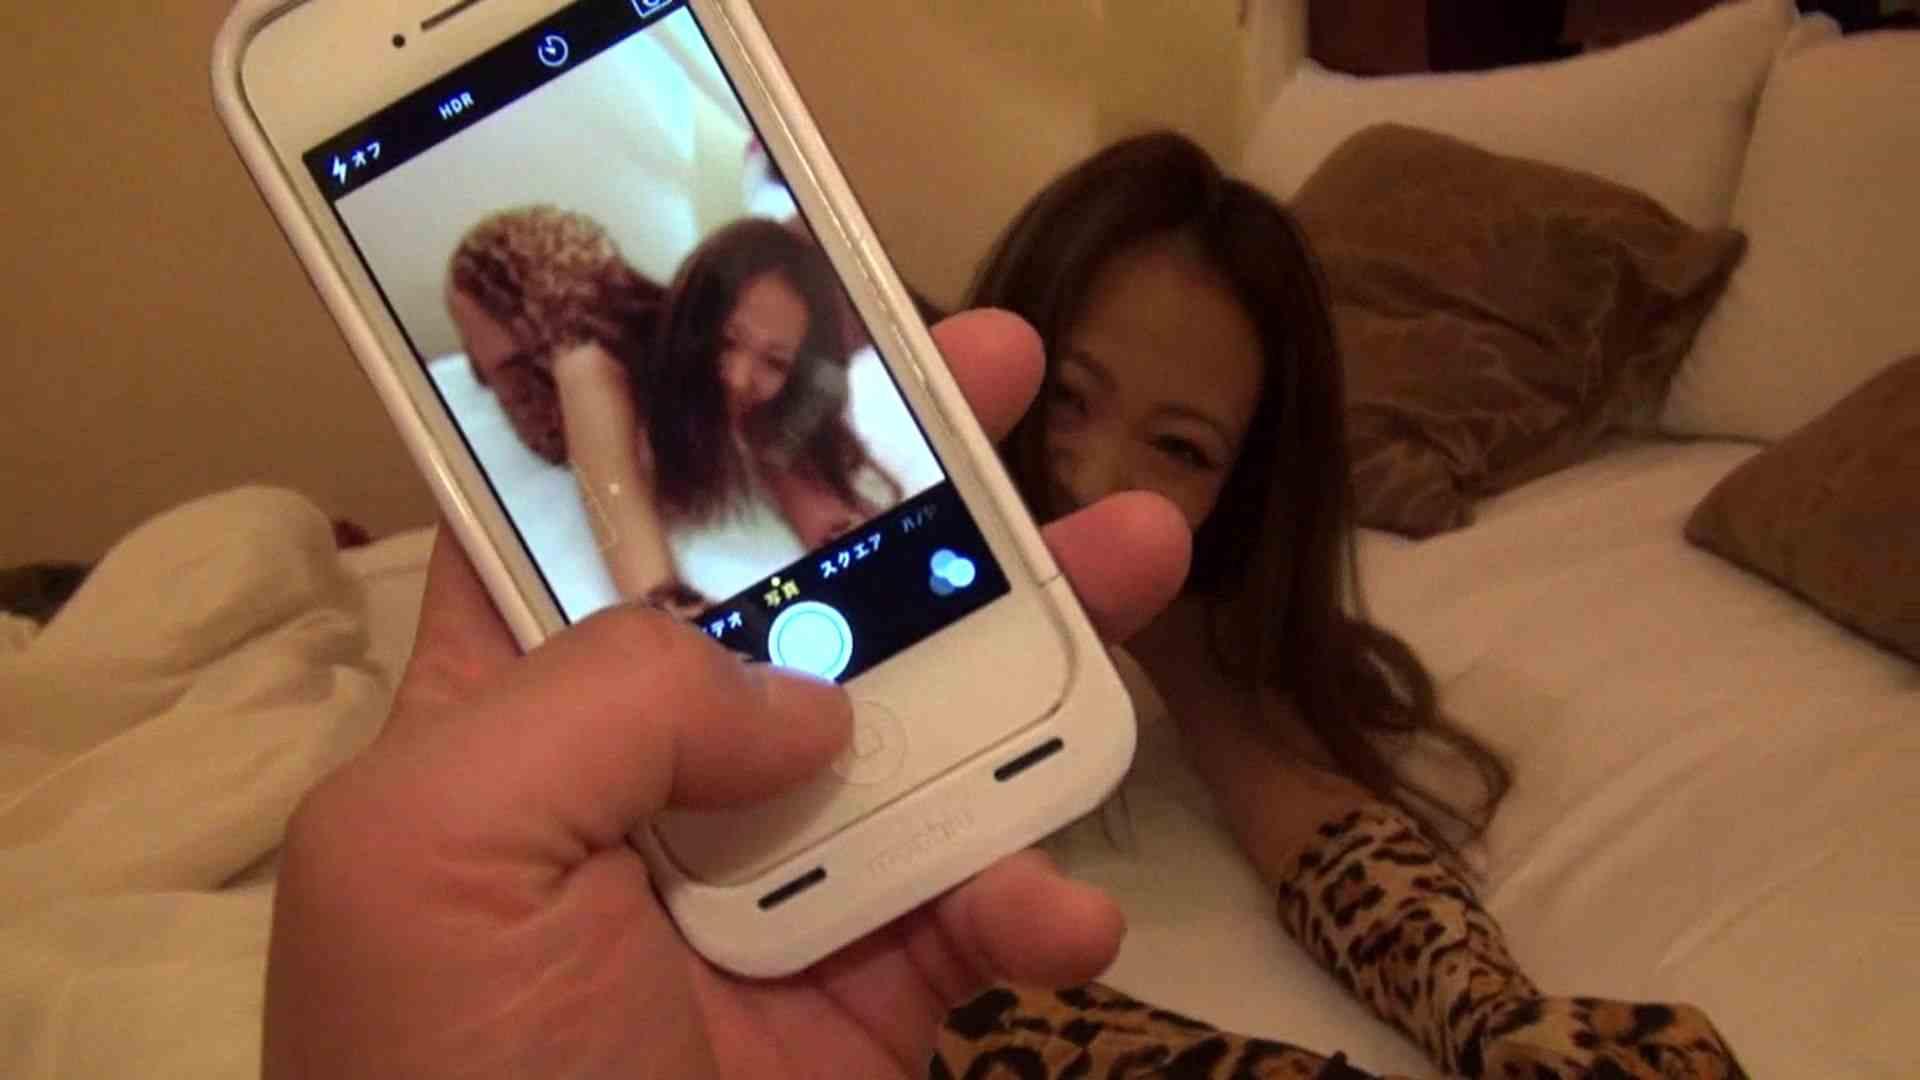 S級厳選美女ビッチガールVol.52 前編 モデル流出動画 | すけべな美女  82画像 73